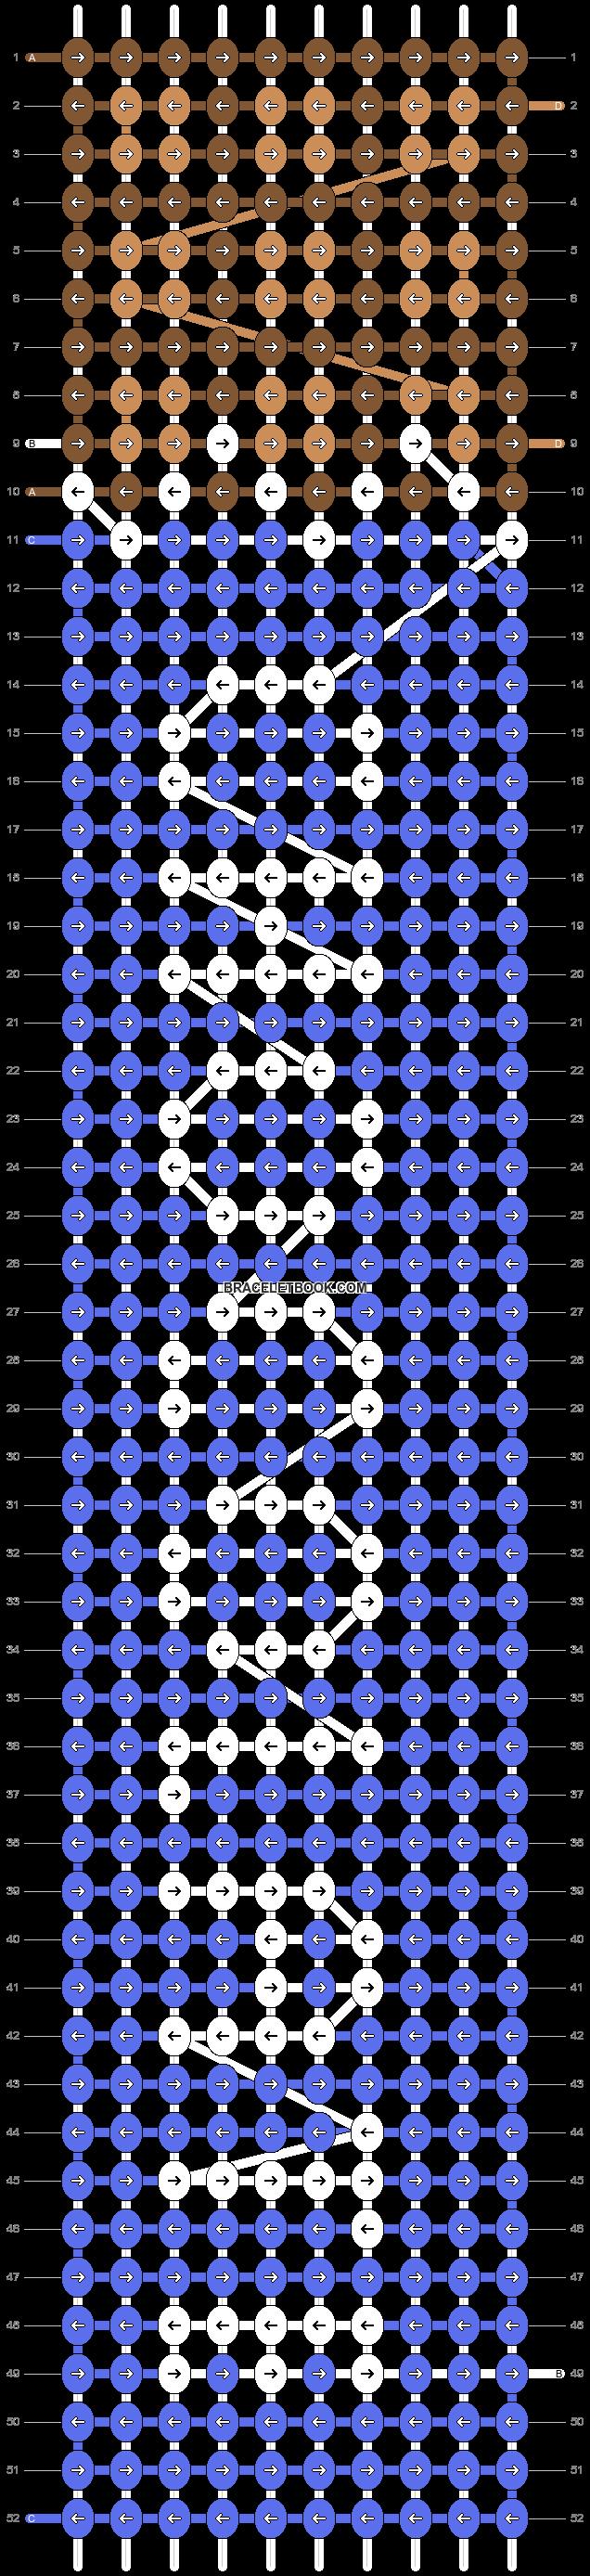 Alpha pattern #15286 pattern